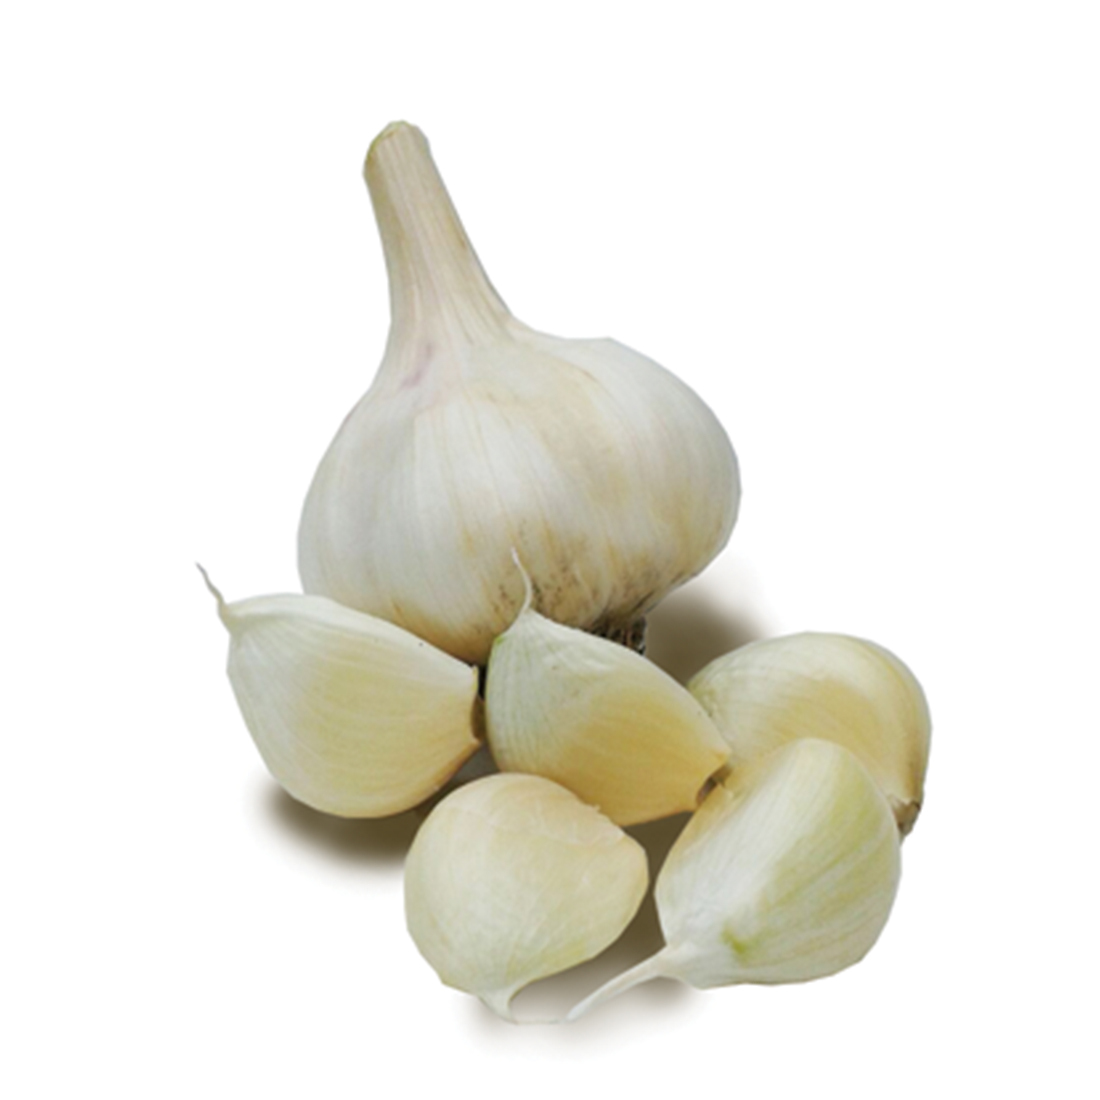 Planting garlic in 2019: calendar 41